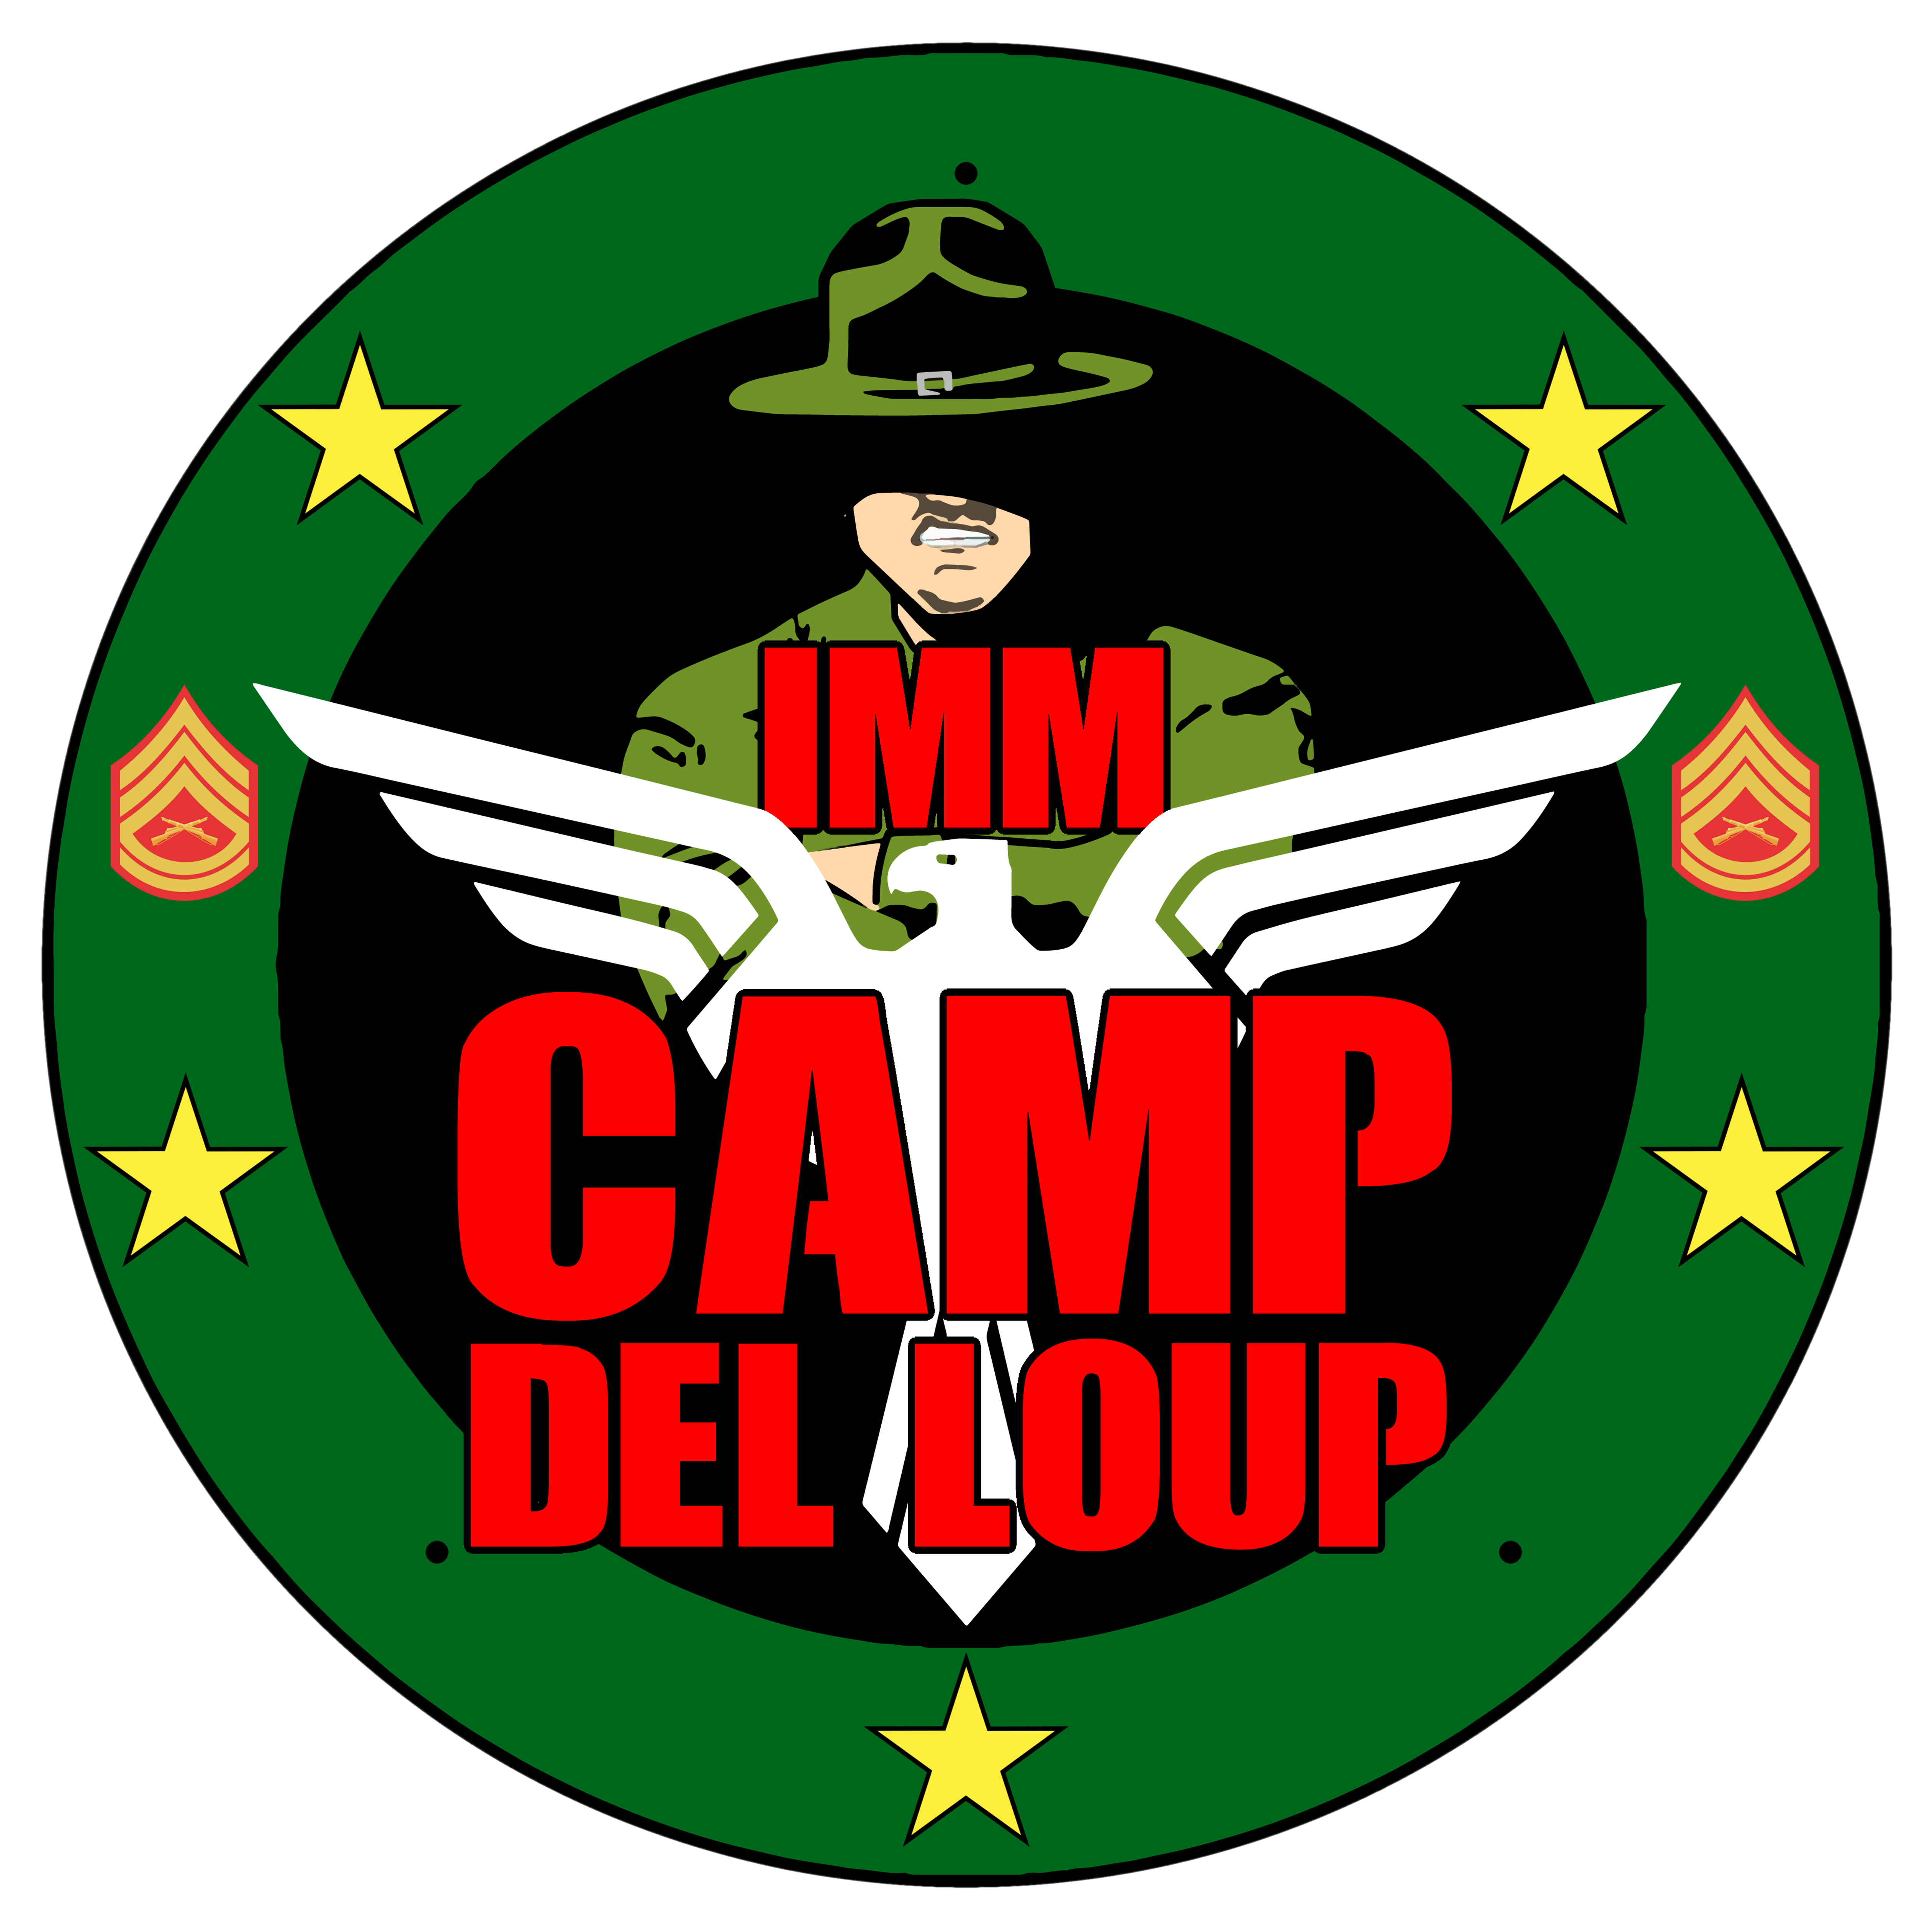 Logo Camp del loup1